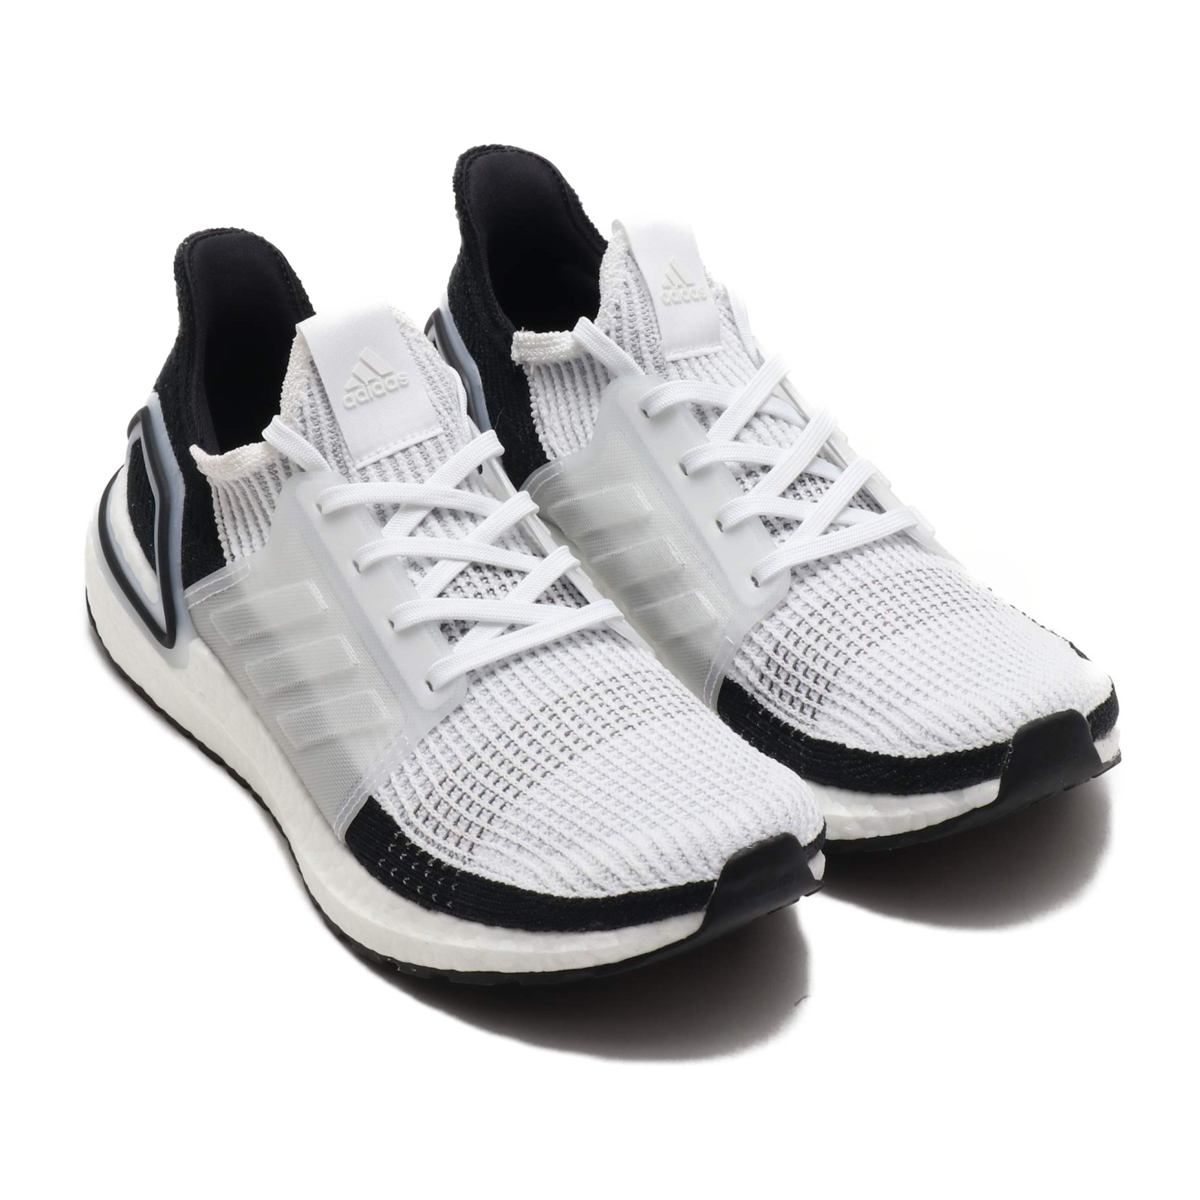 adidas UltraBOOST 19(アディダス ウルトラブースト 19)RUNNING WHITE/RUNNING WHITE/GREY TWO【メンズ レディース スニーカー】19SS-S